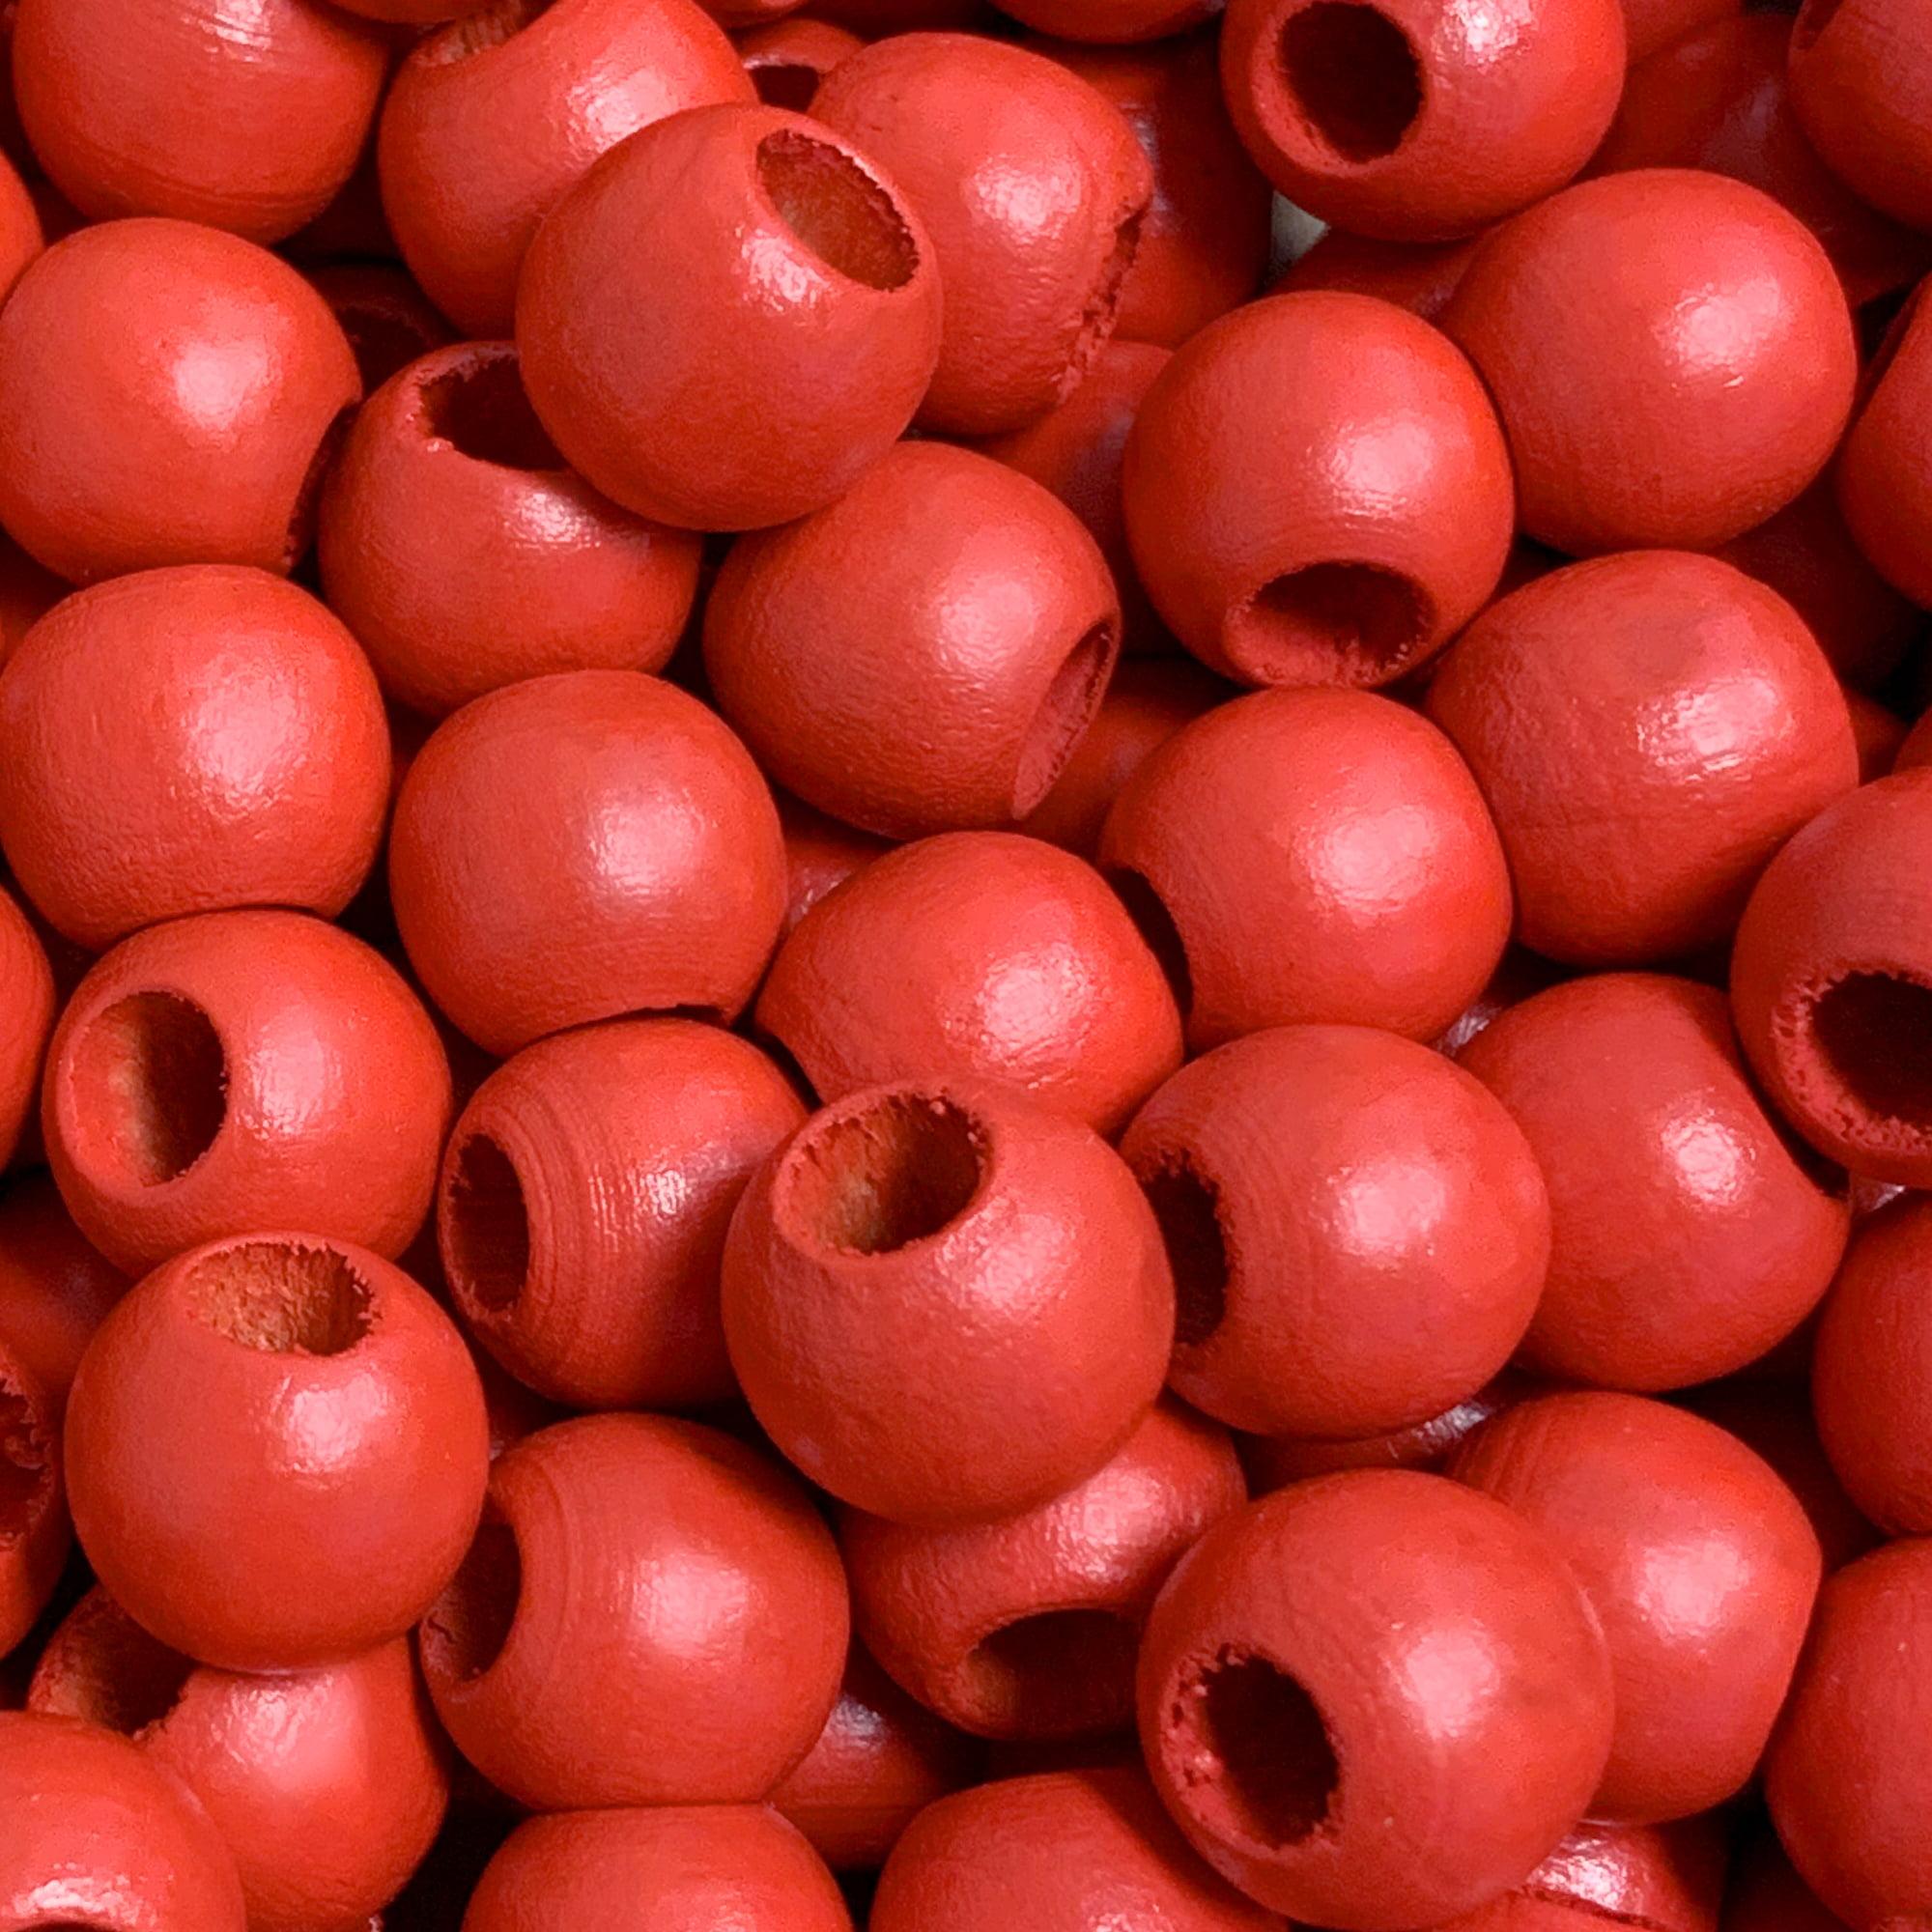 Polished 12 mm Diameter Meadow Green Rayher Wooden Beads FSC 100/% 12mm /ø